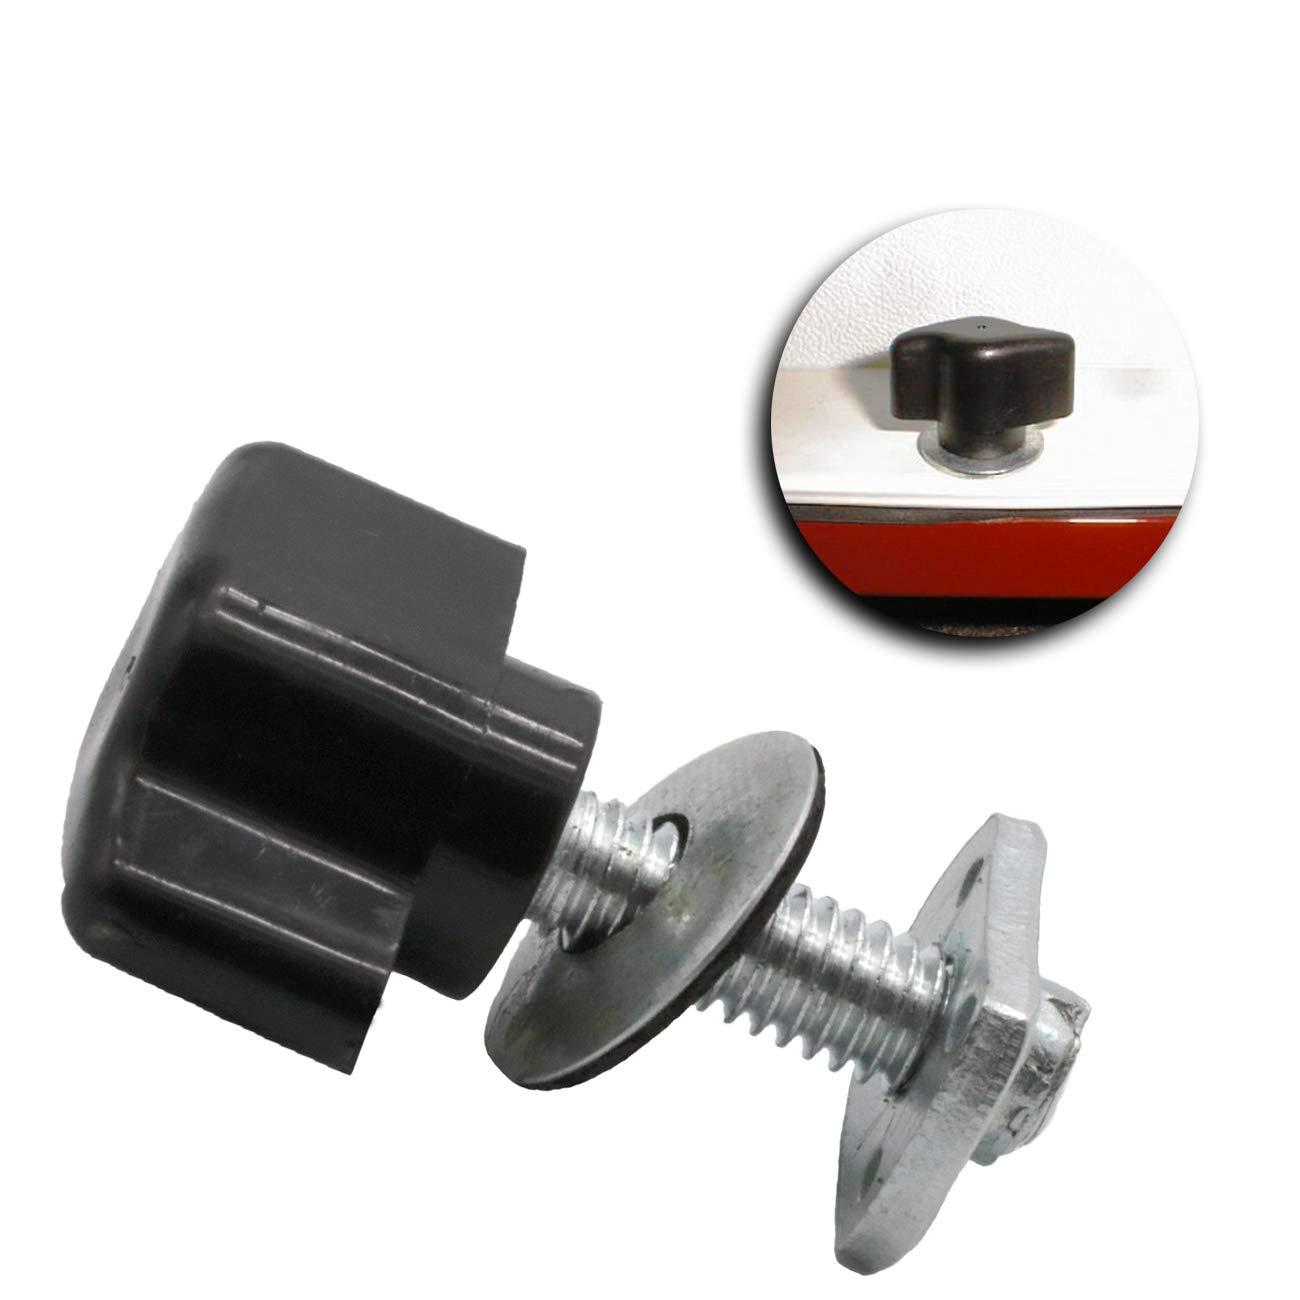 Black MFC Universal 8 Pcs Hard Top Quick Removal Fastener Thumb Screw and Nut Kit for 1995-2019 Jeep Wrangler YJ TJ JK JL Sports Sahara Freedom Rubicon X /& Unlimited X 2 Door 4 Door